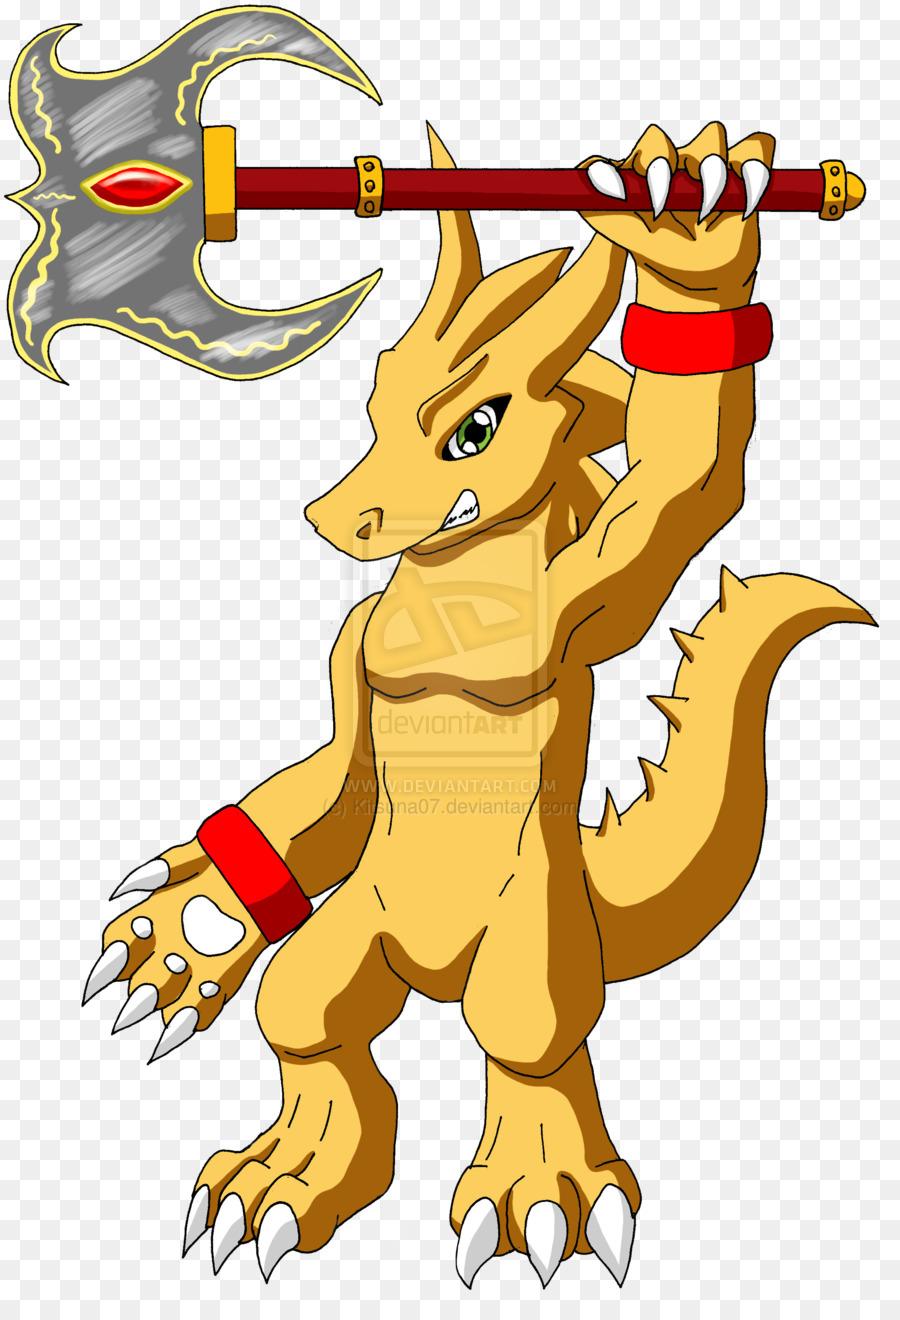 Descarga gratuita de Digimon Story Perdido De La Evolución, Agumon, Palmon Imágen de Png